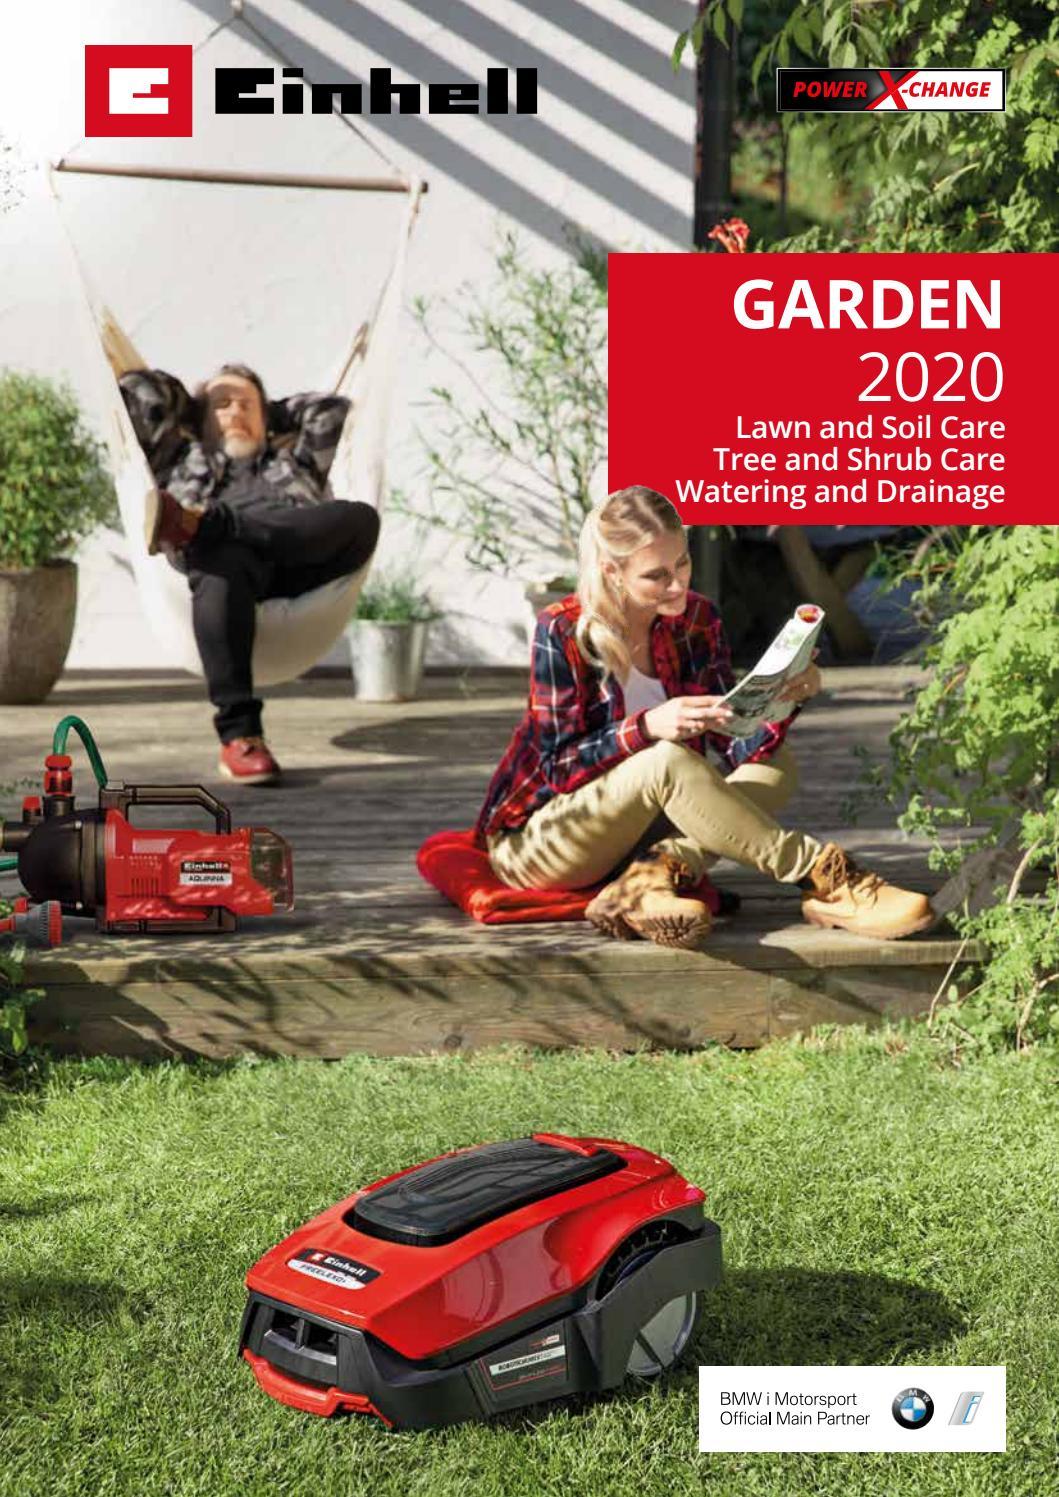 Lawn Mower Grinder-2.1 in *1.9 in Blade Sharpener Home Garden Tool